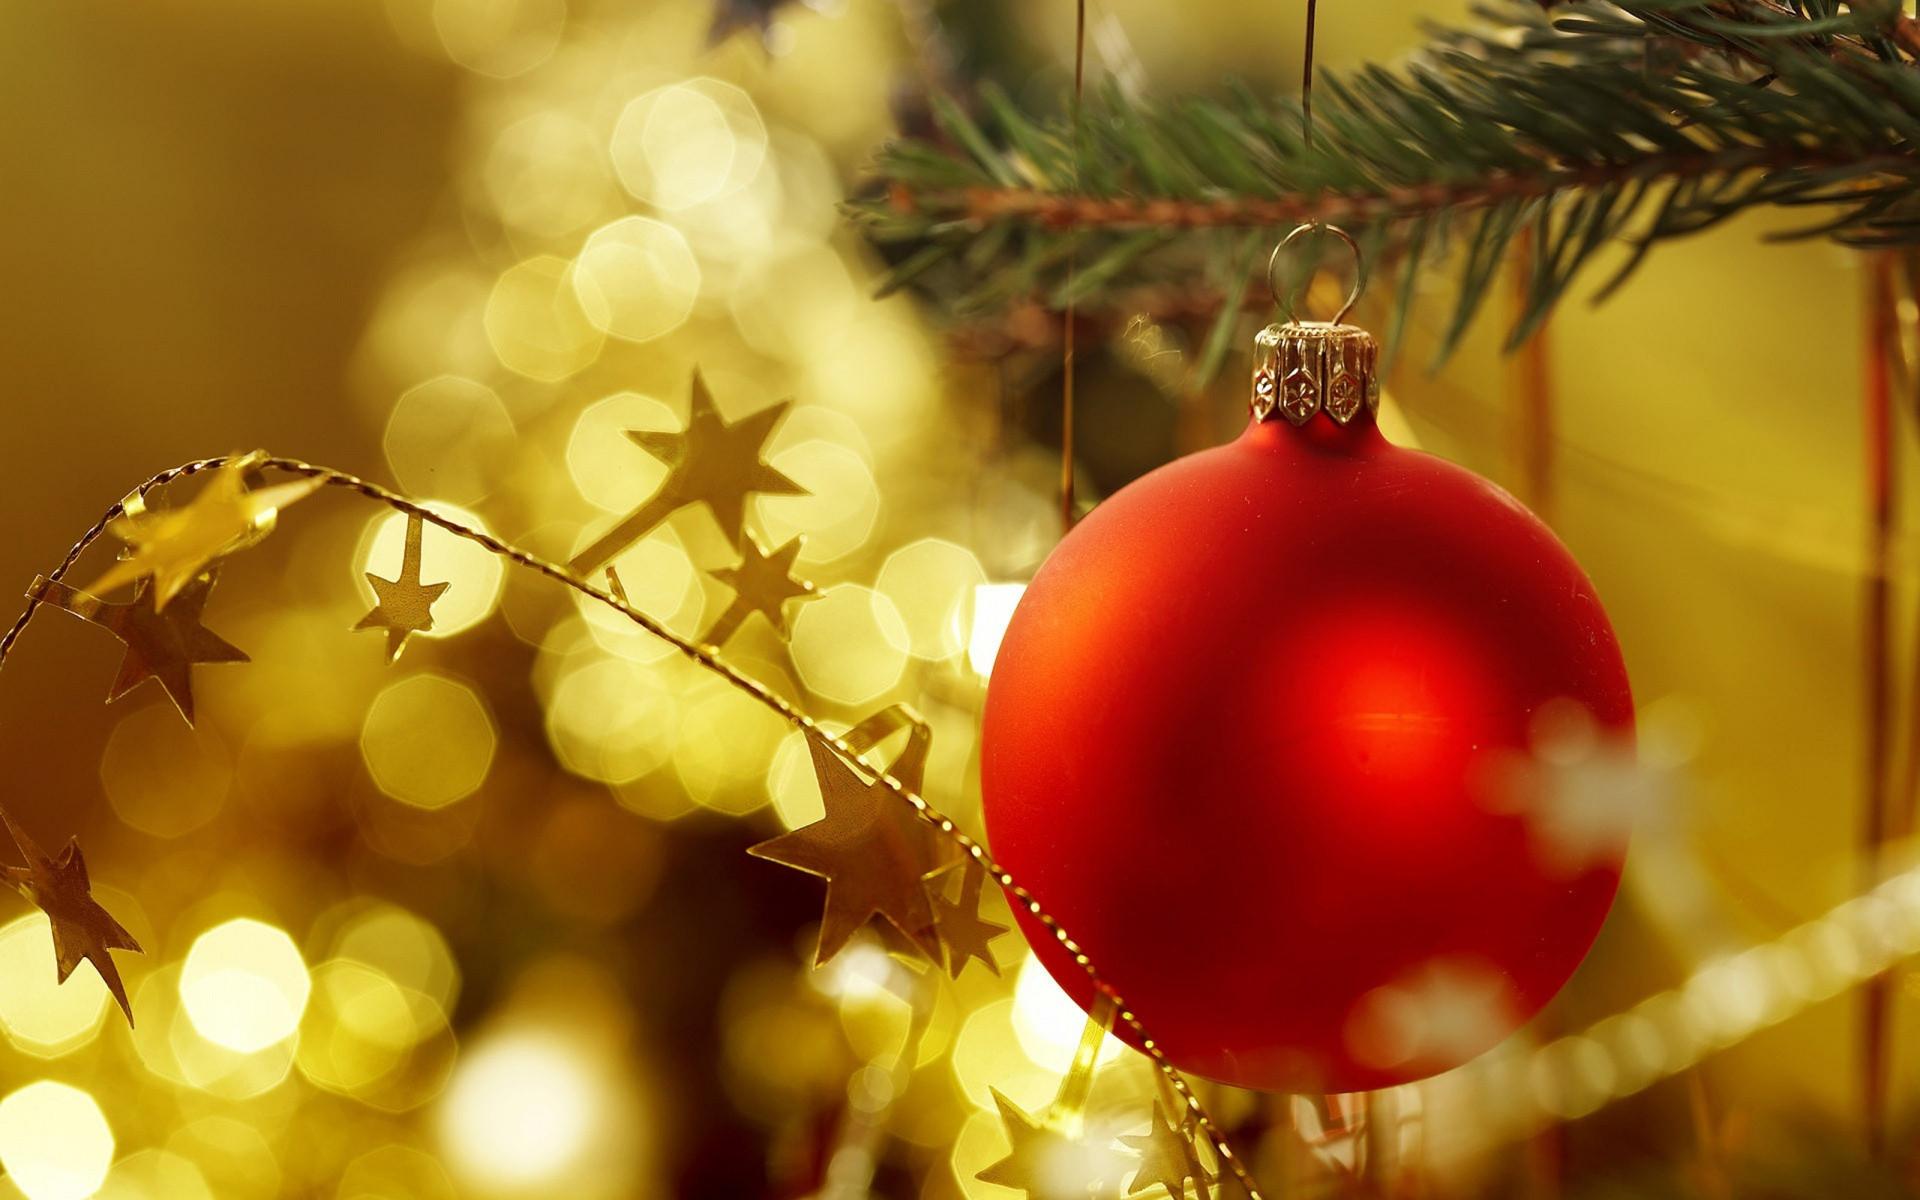 Lovely Christmas Ornaments Wallpaper